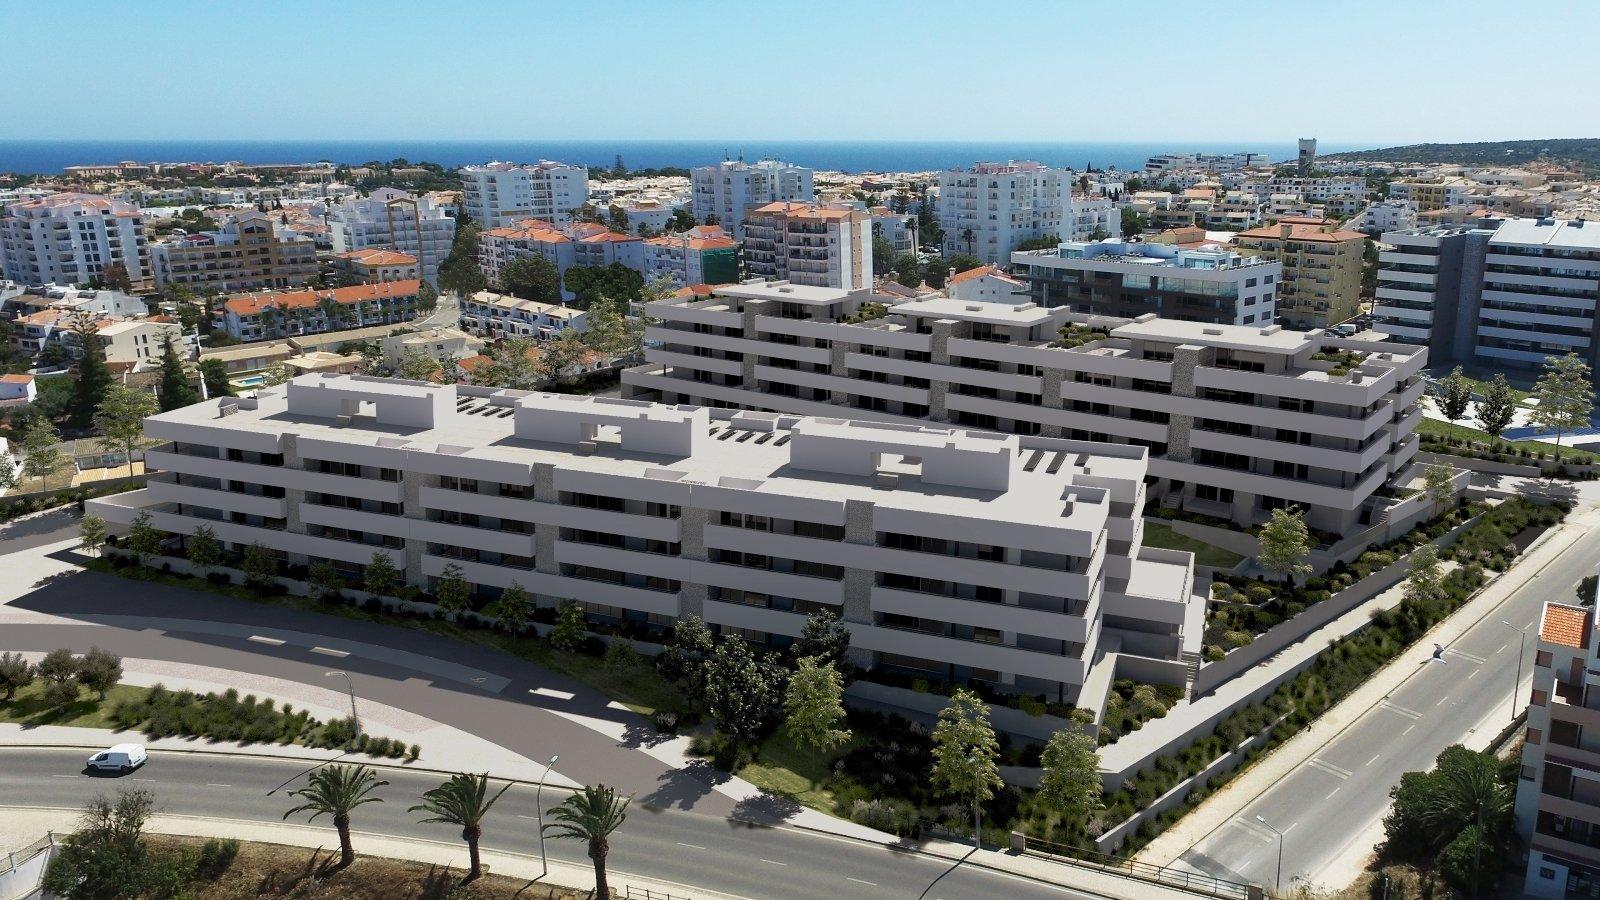 3 Bedroom Apartment Lagos, Western Algarve Ref: GA414B